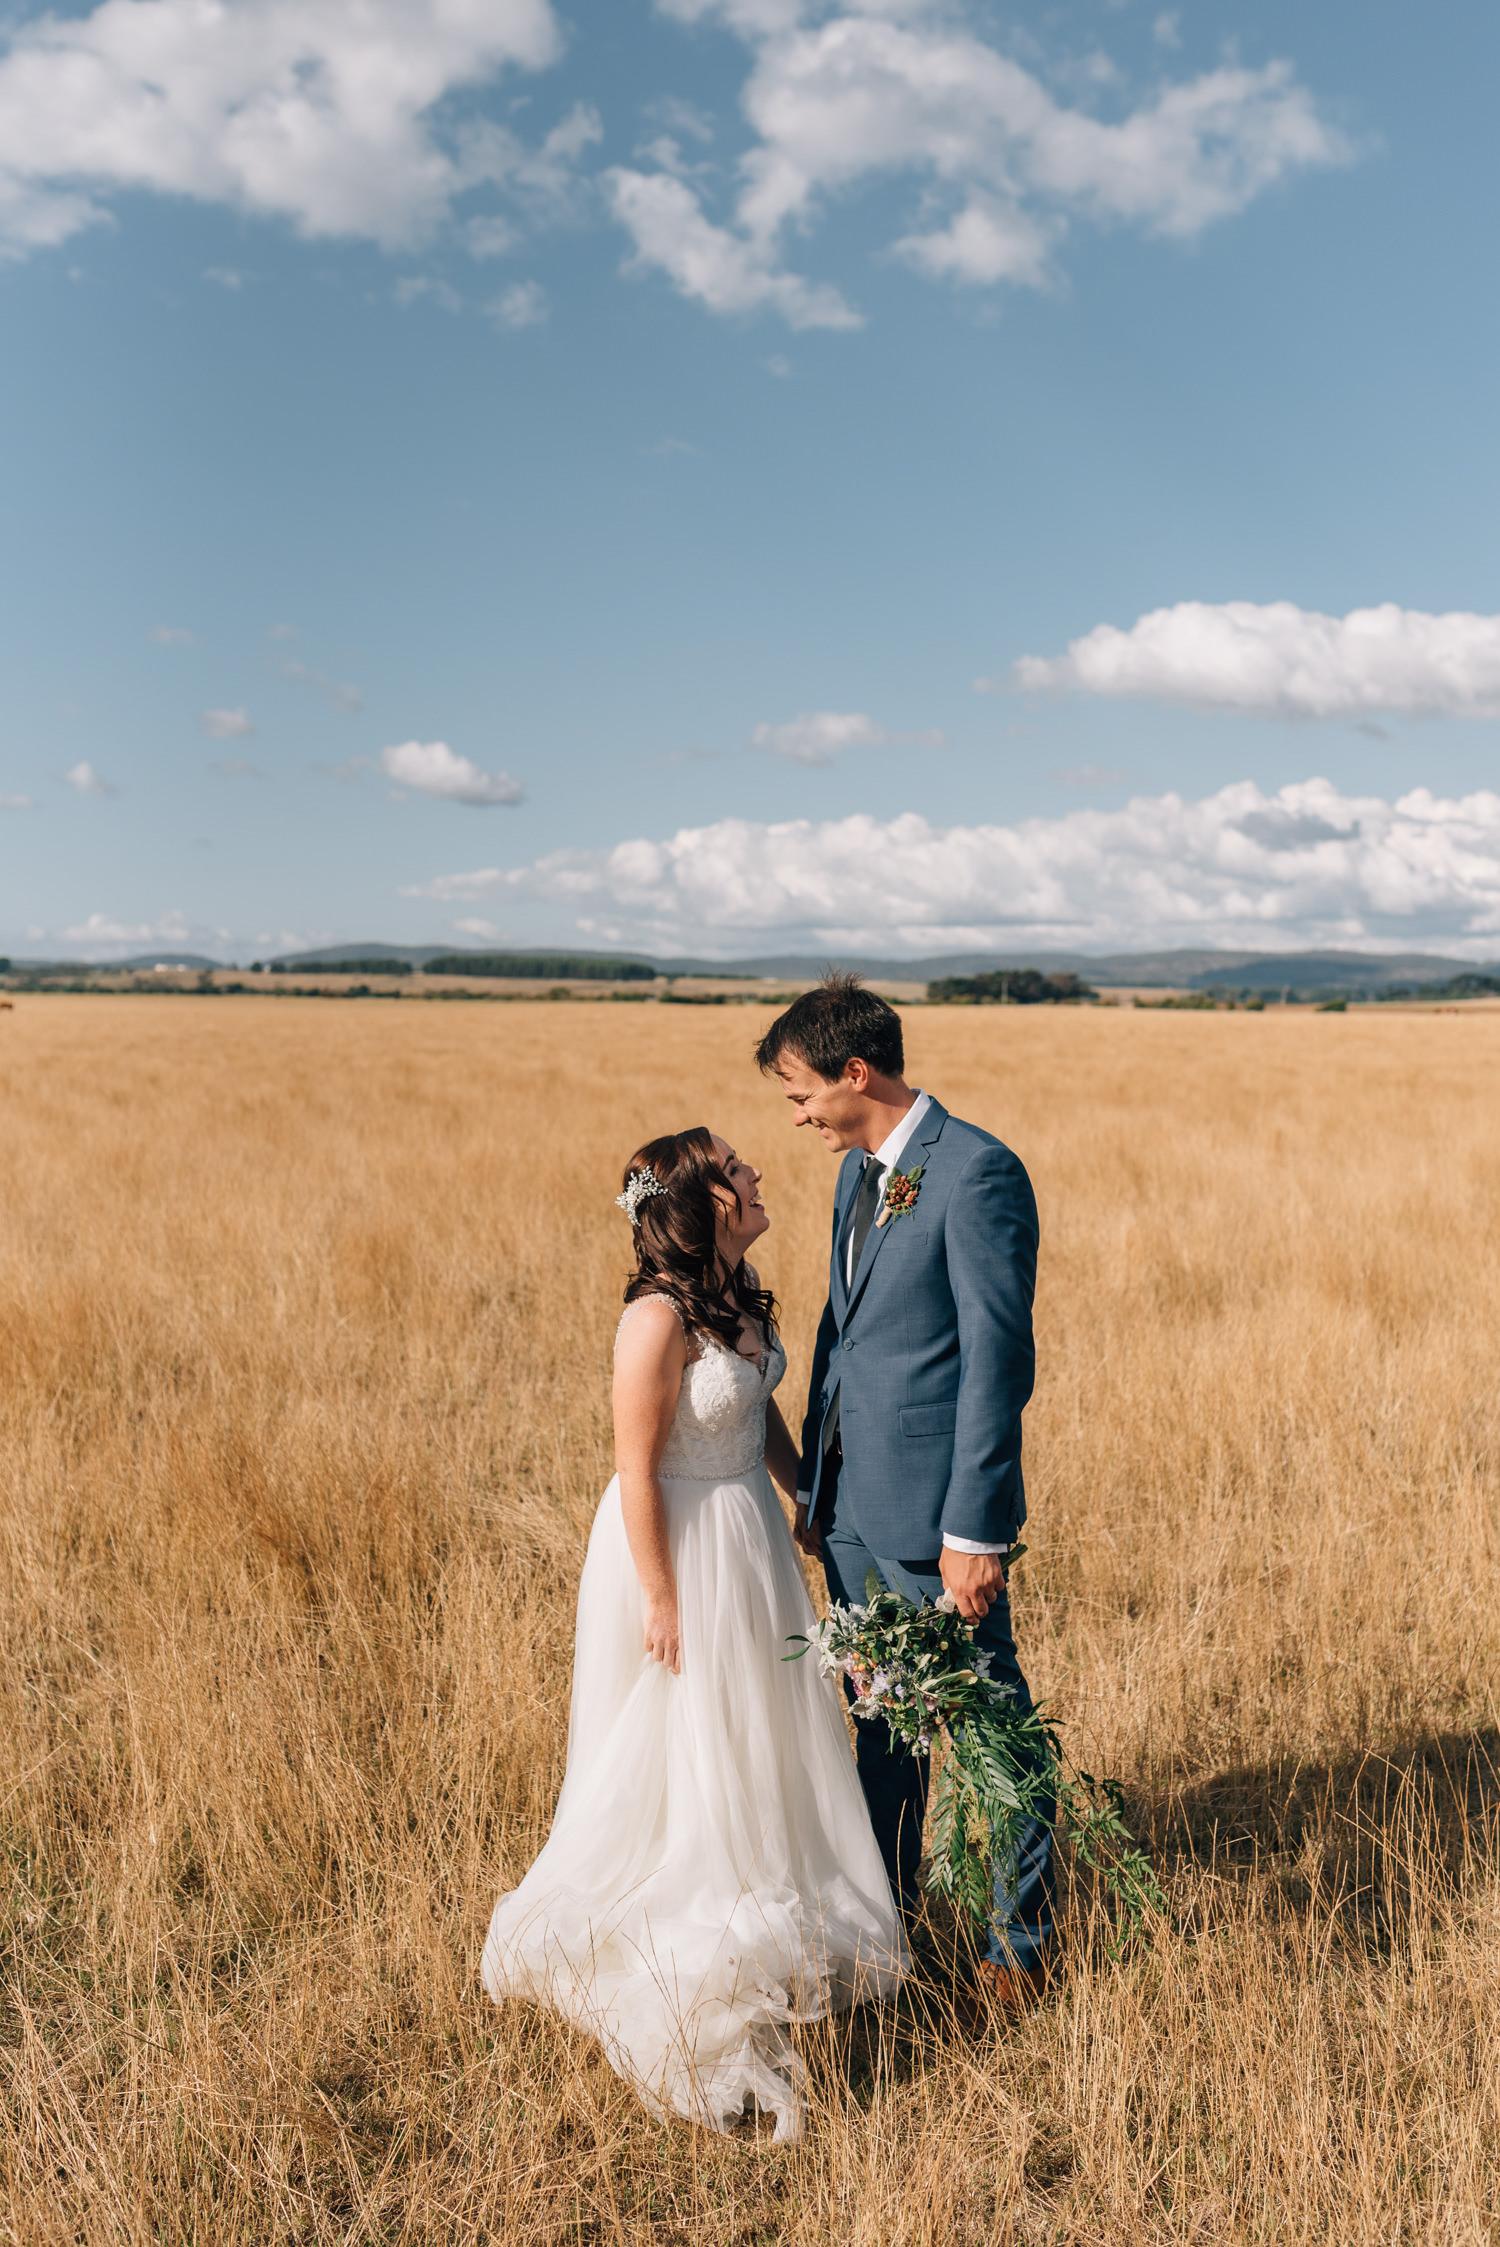 Quamby-Wedding-Photographer-115.jpg